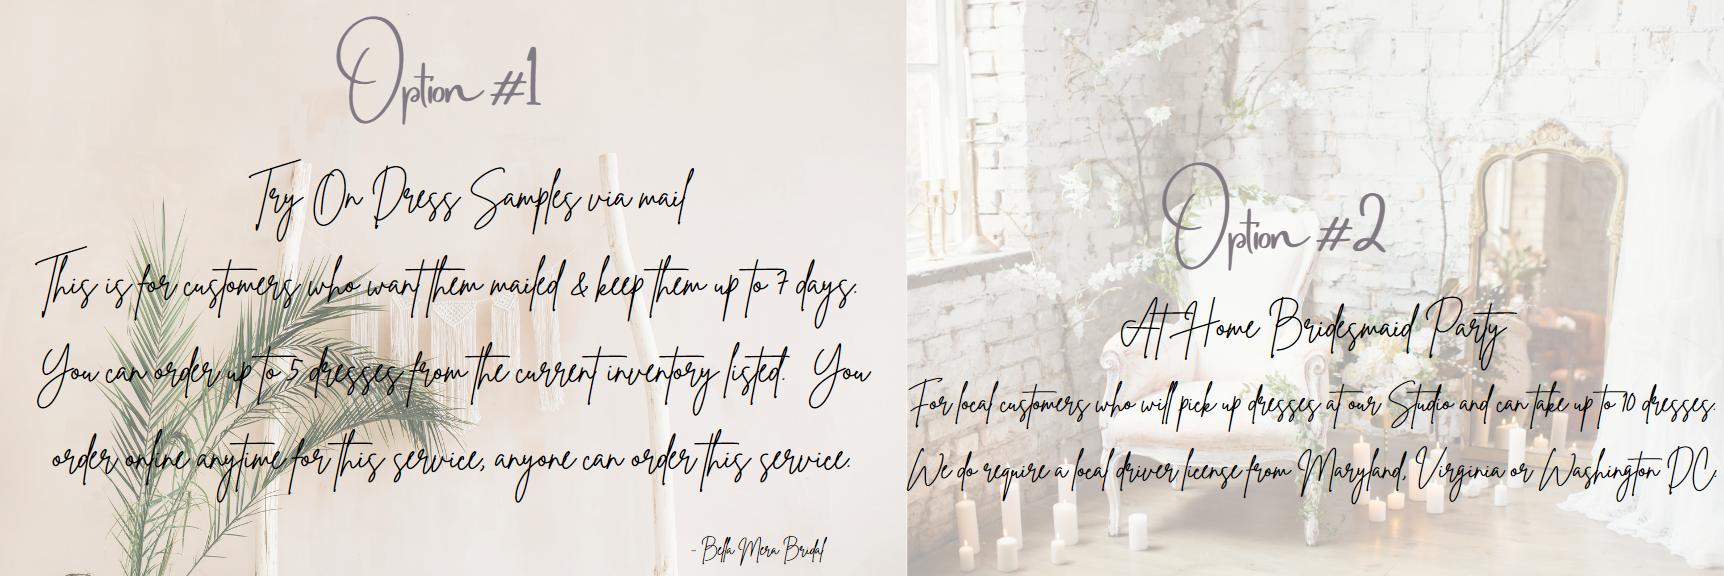 bella-mera-bridal-try-on-bridesmaids-samples-at-home-service.png